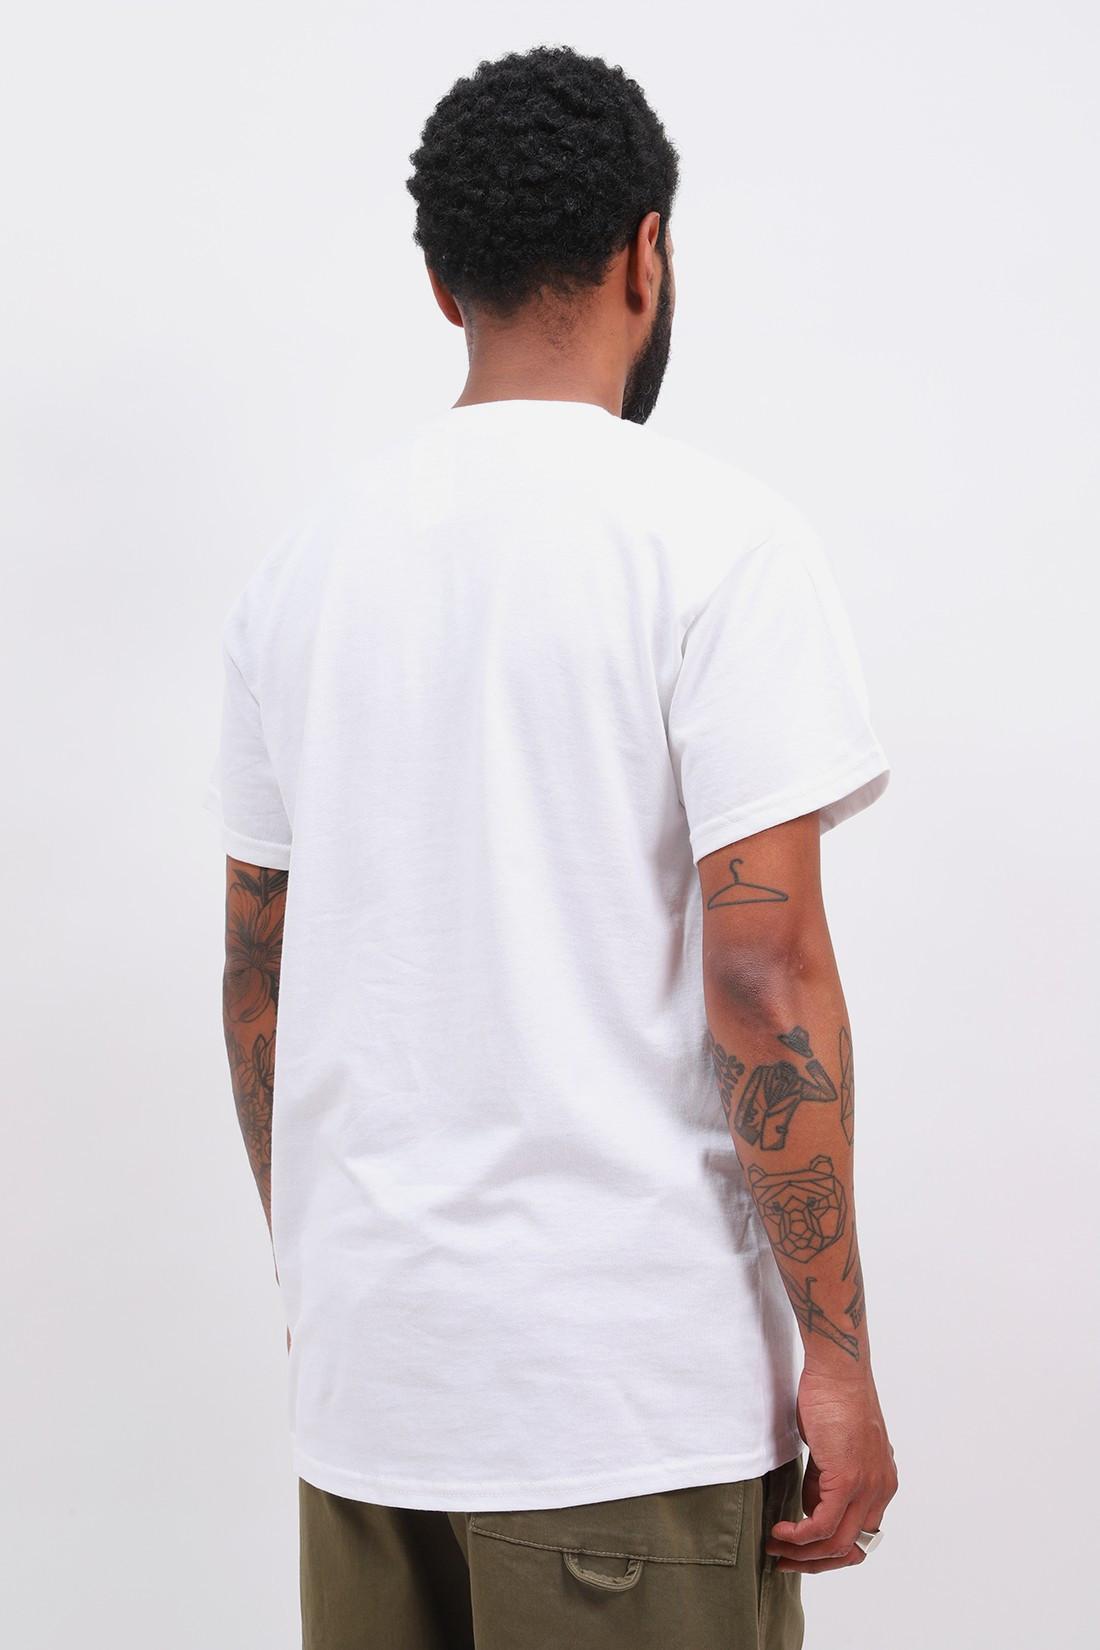 BISOUS SKATEBOARDS / T shirt cap d adgde White